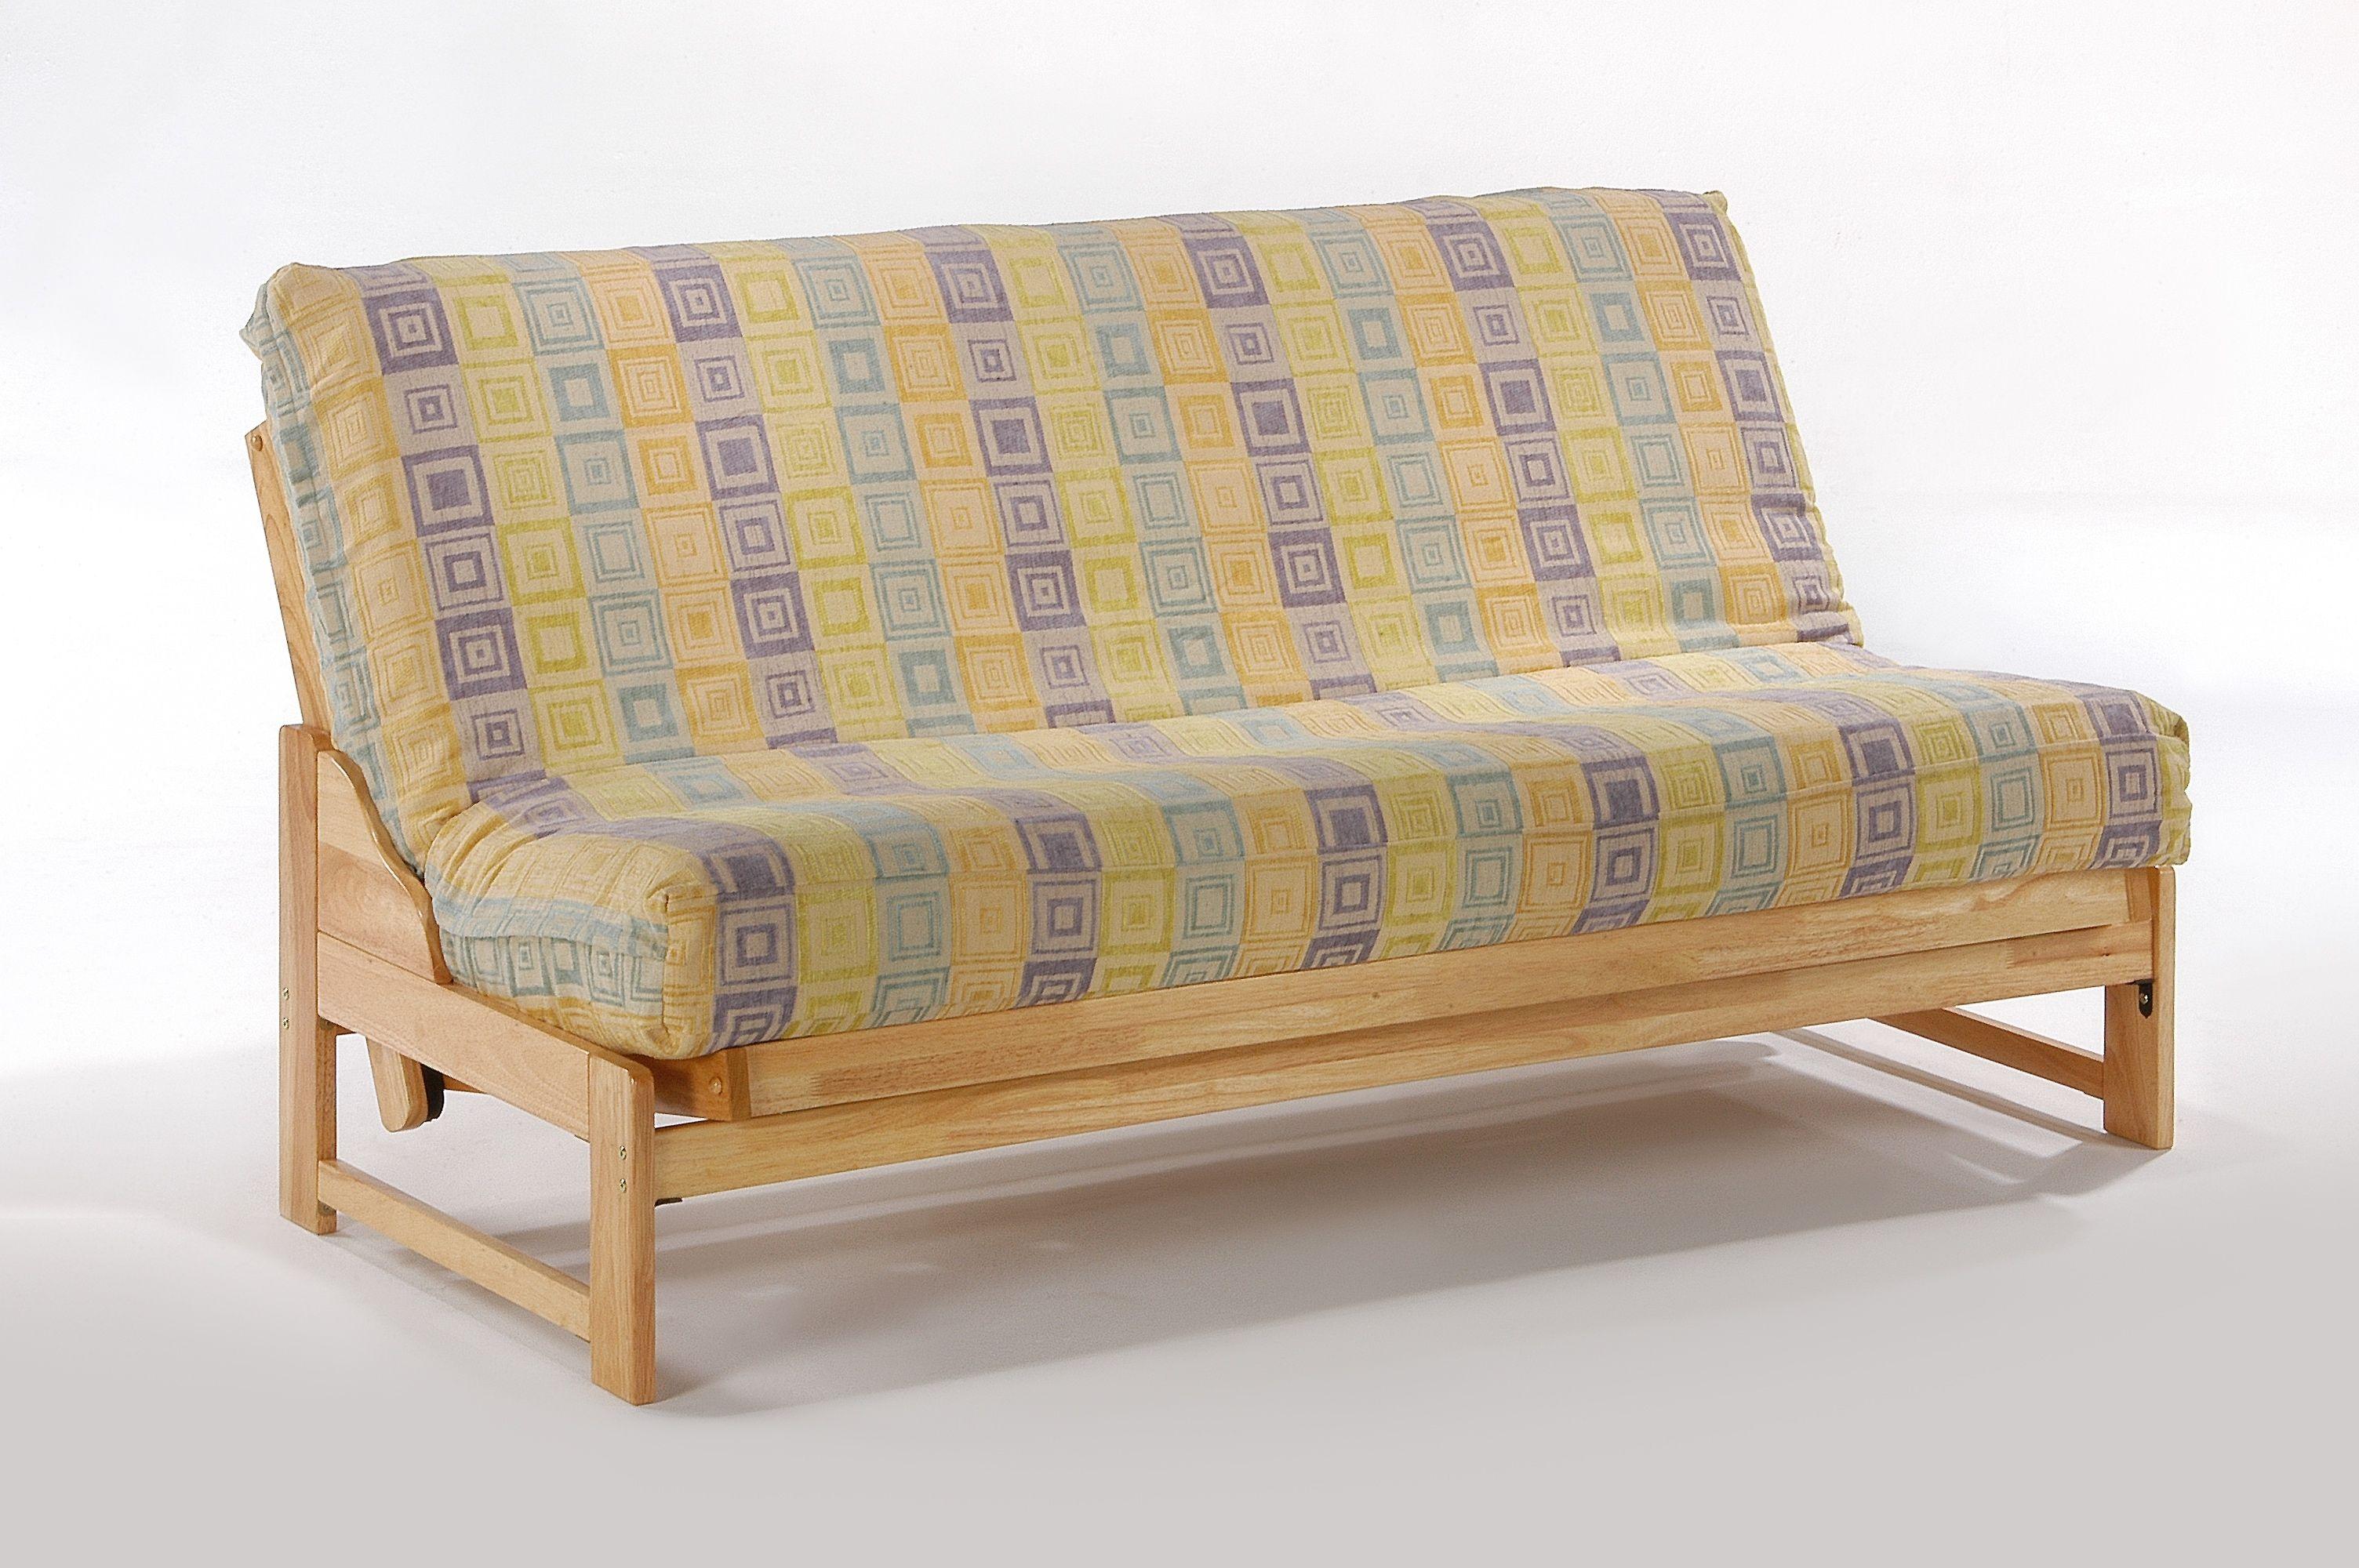 Eureka Microfiber Wood Futon Bed Queen